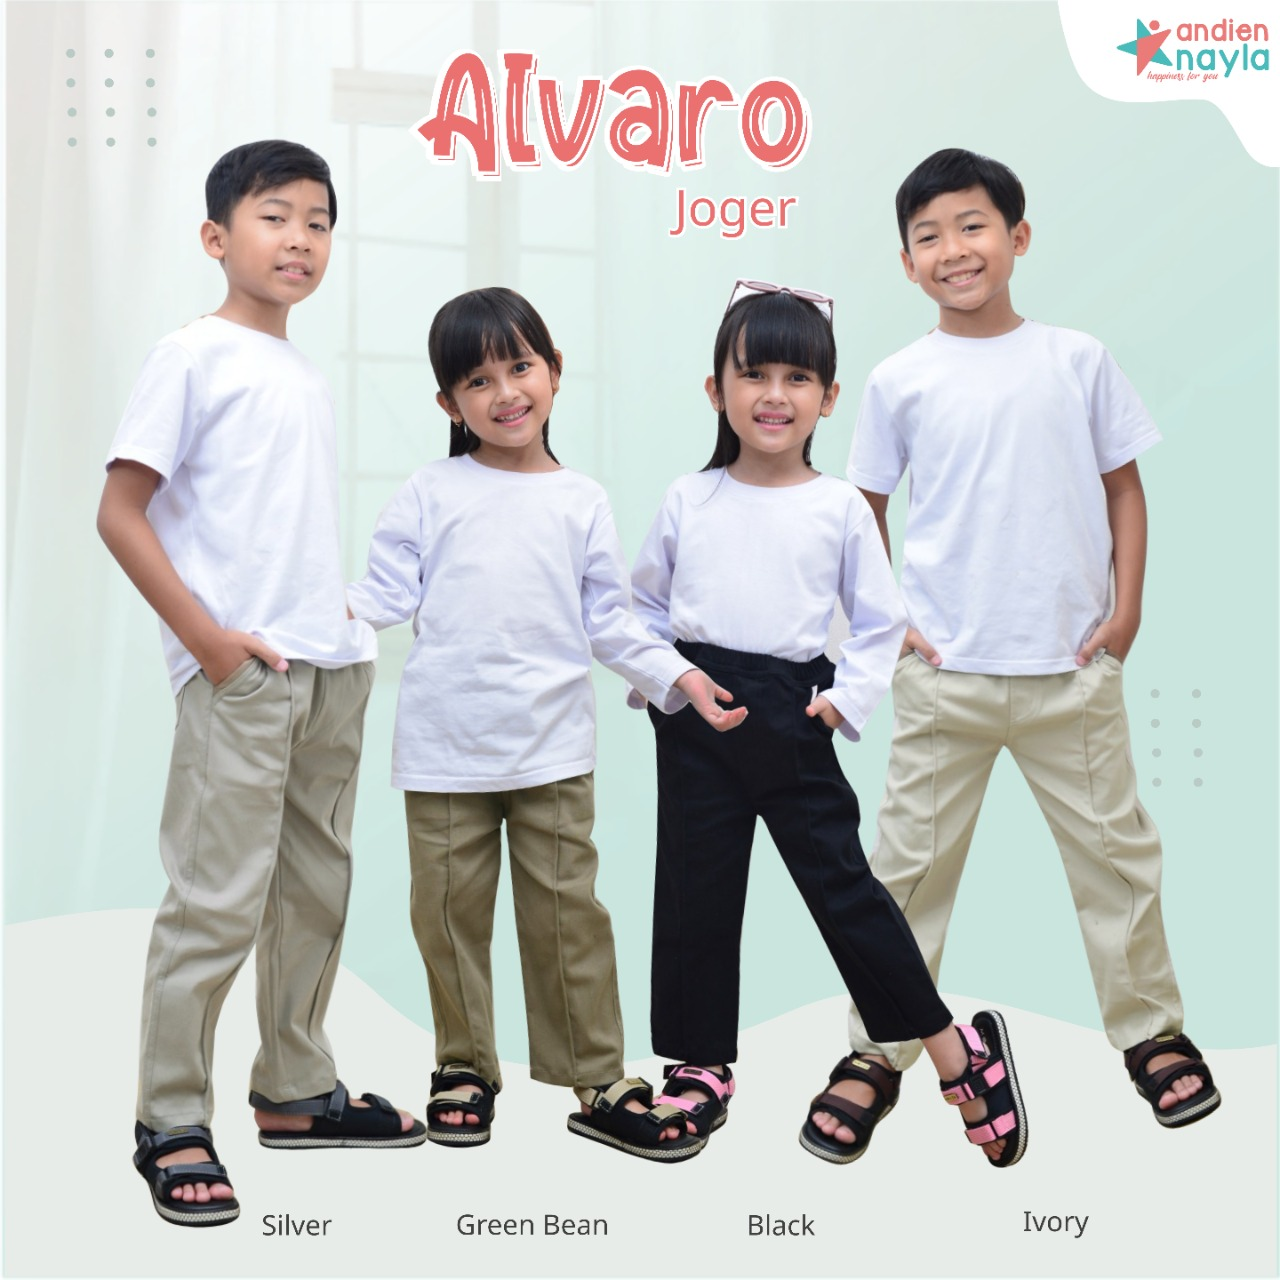 Joger Alvaro